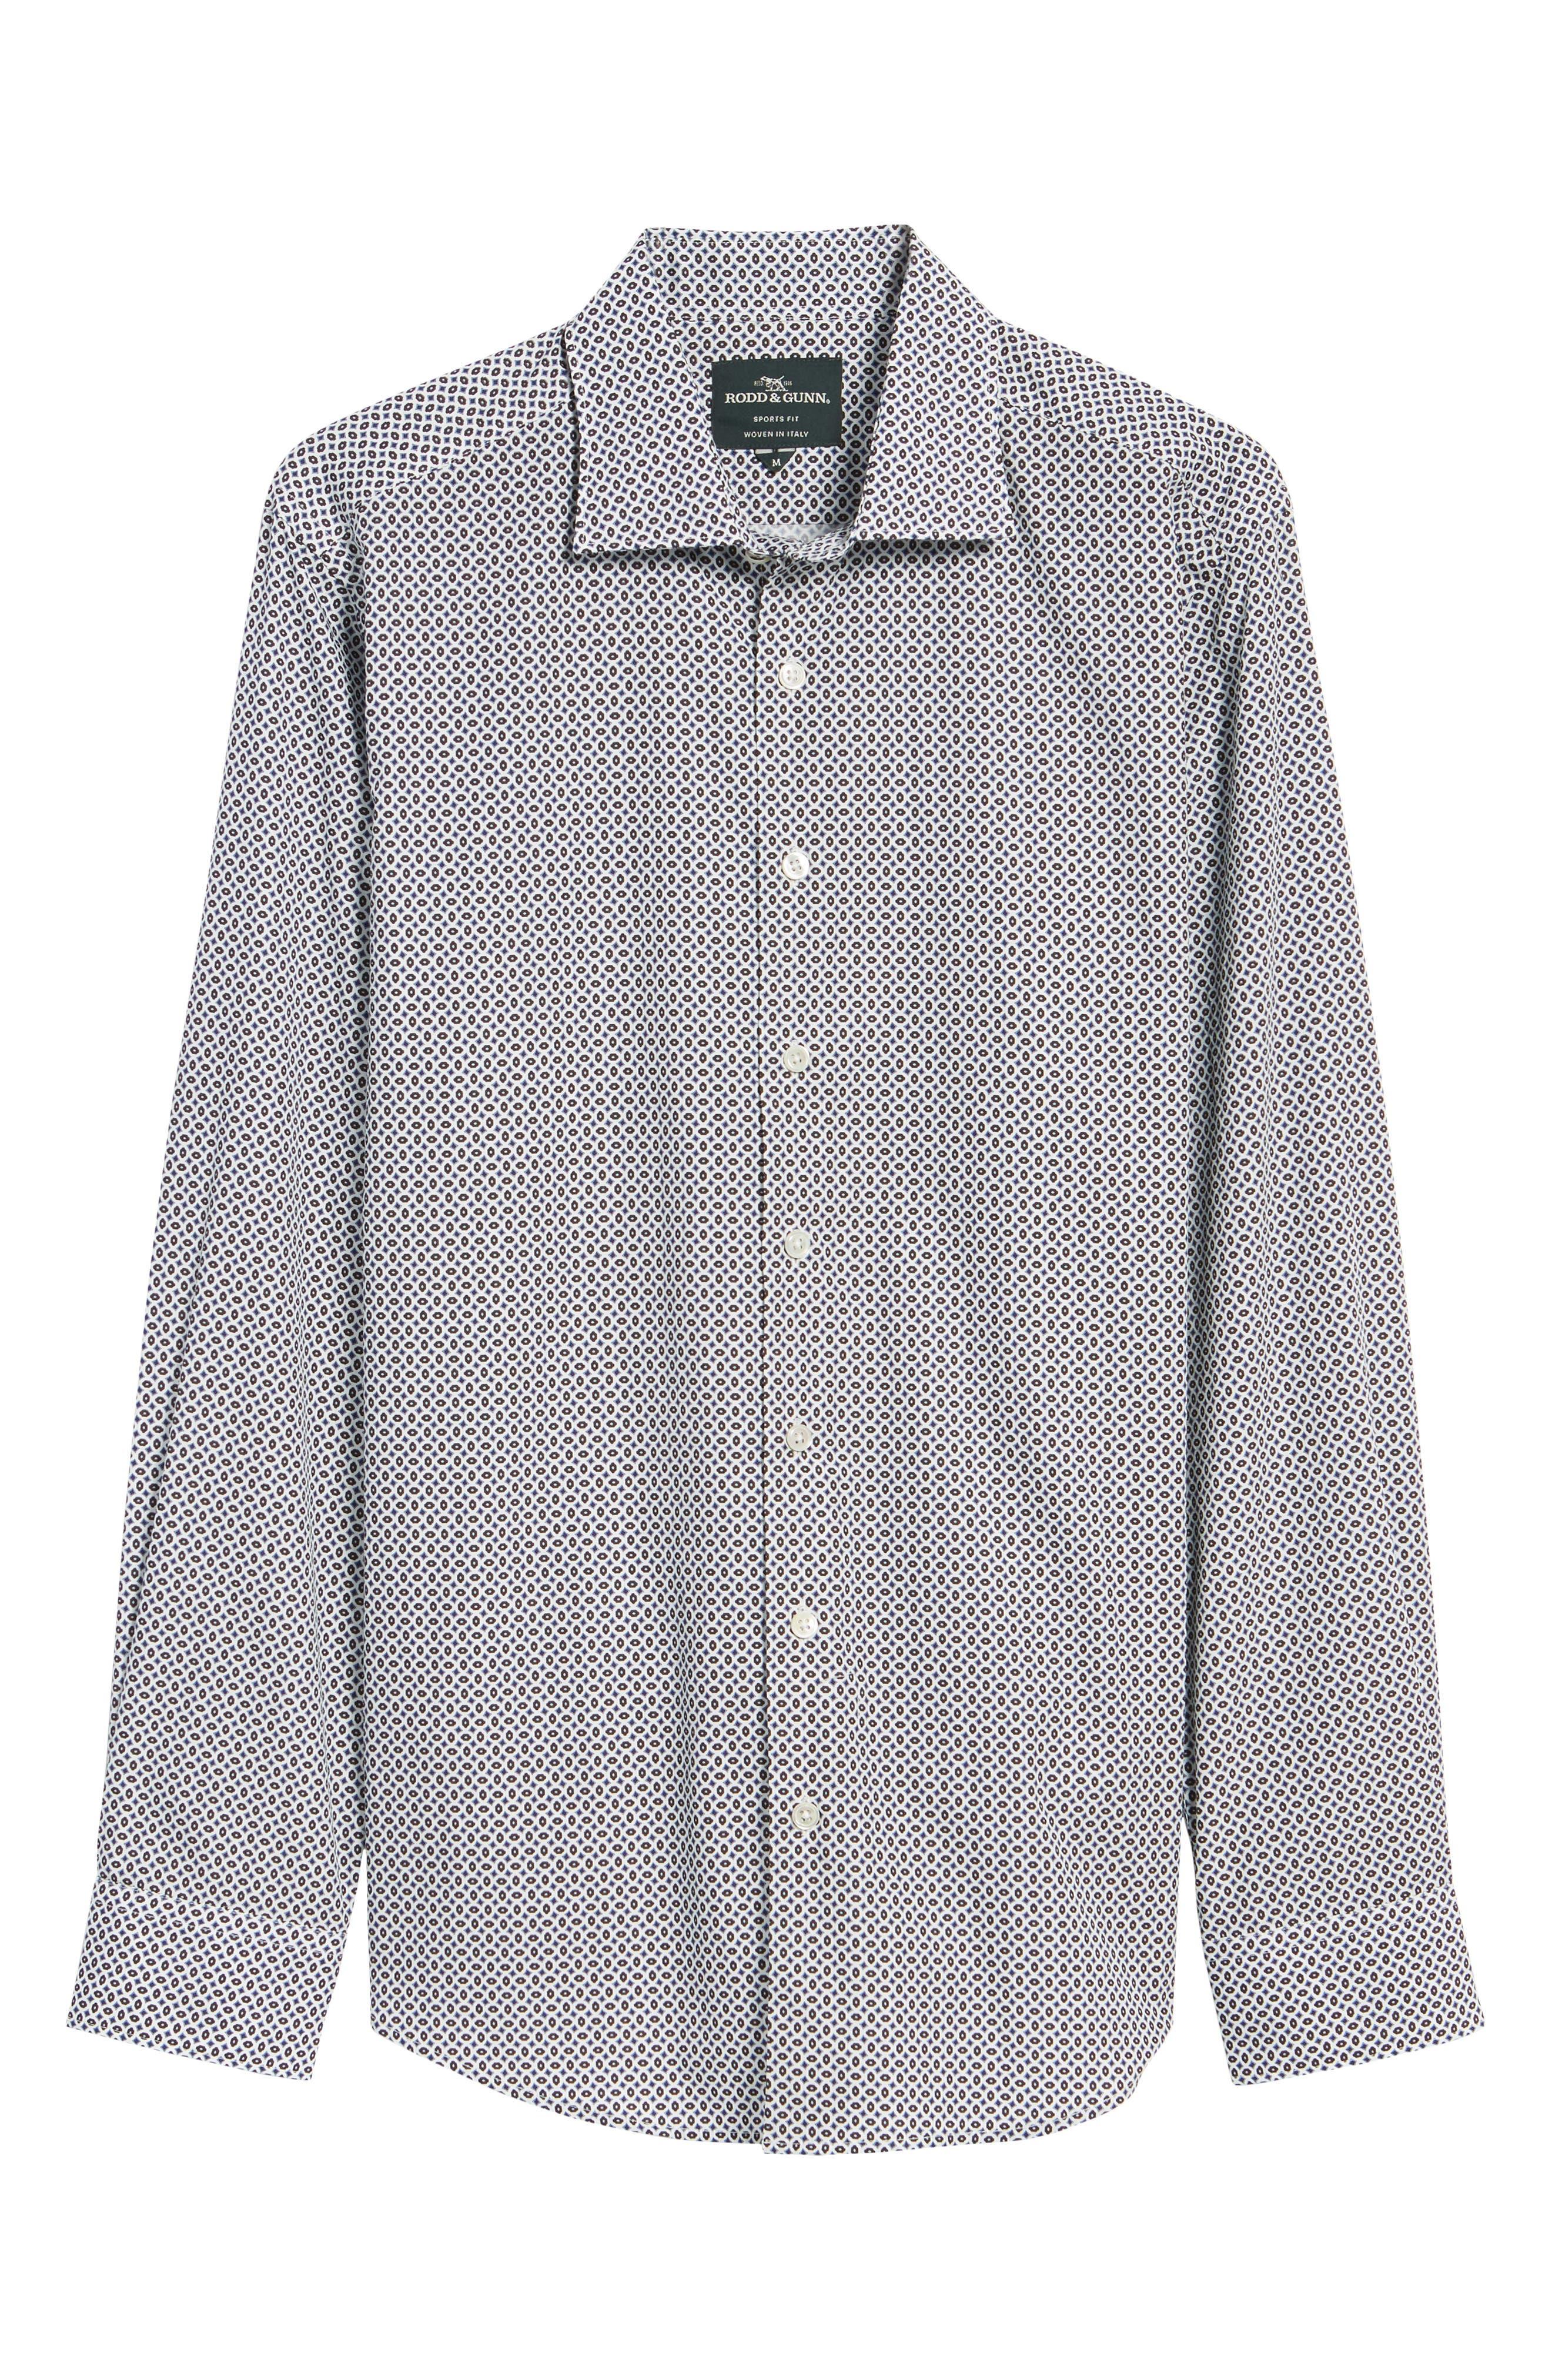 Oak House Regular Fit Sport Shirt,                             Alternate thumbnail 6, color,                             Ivory